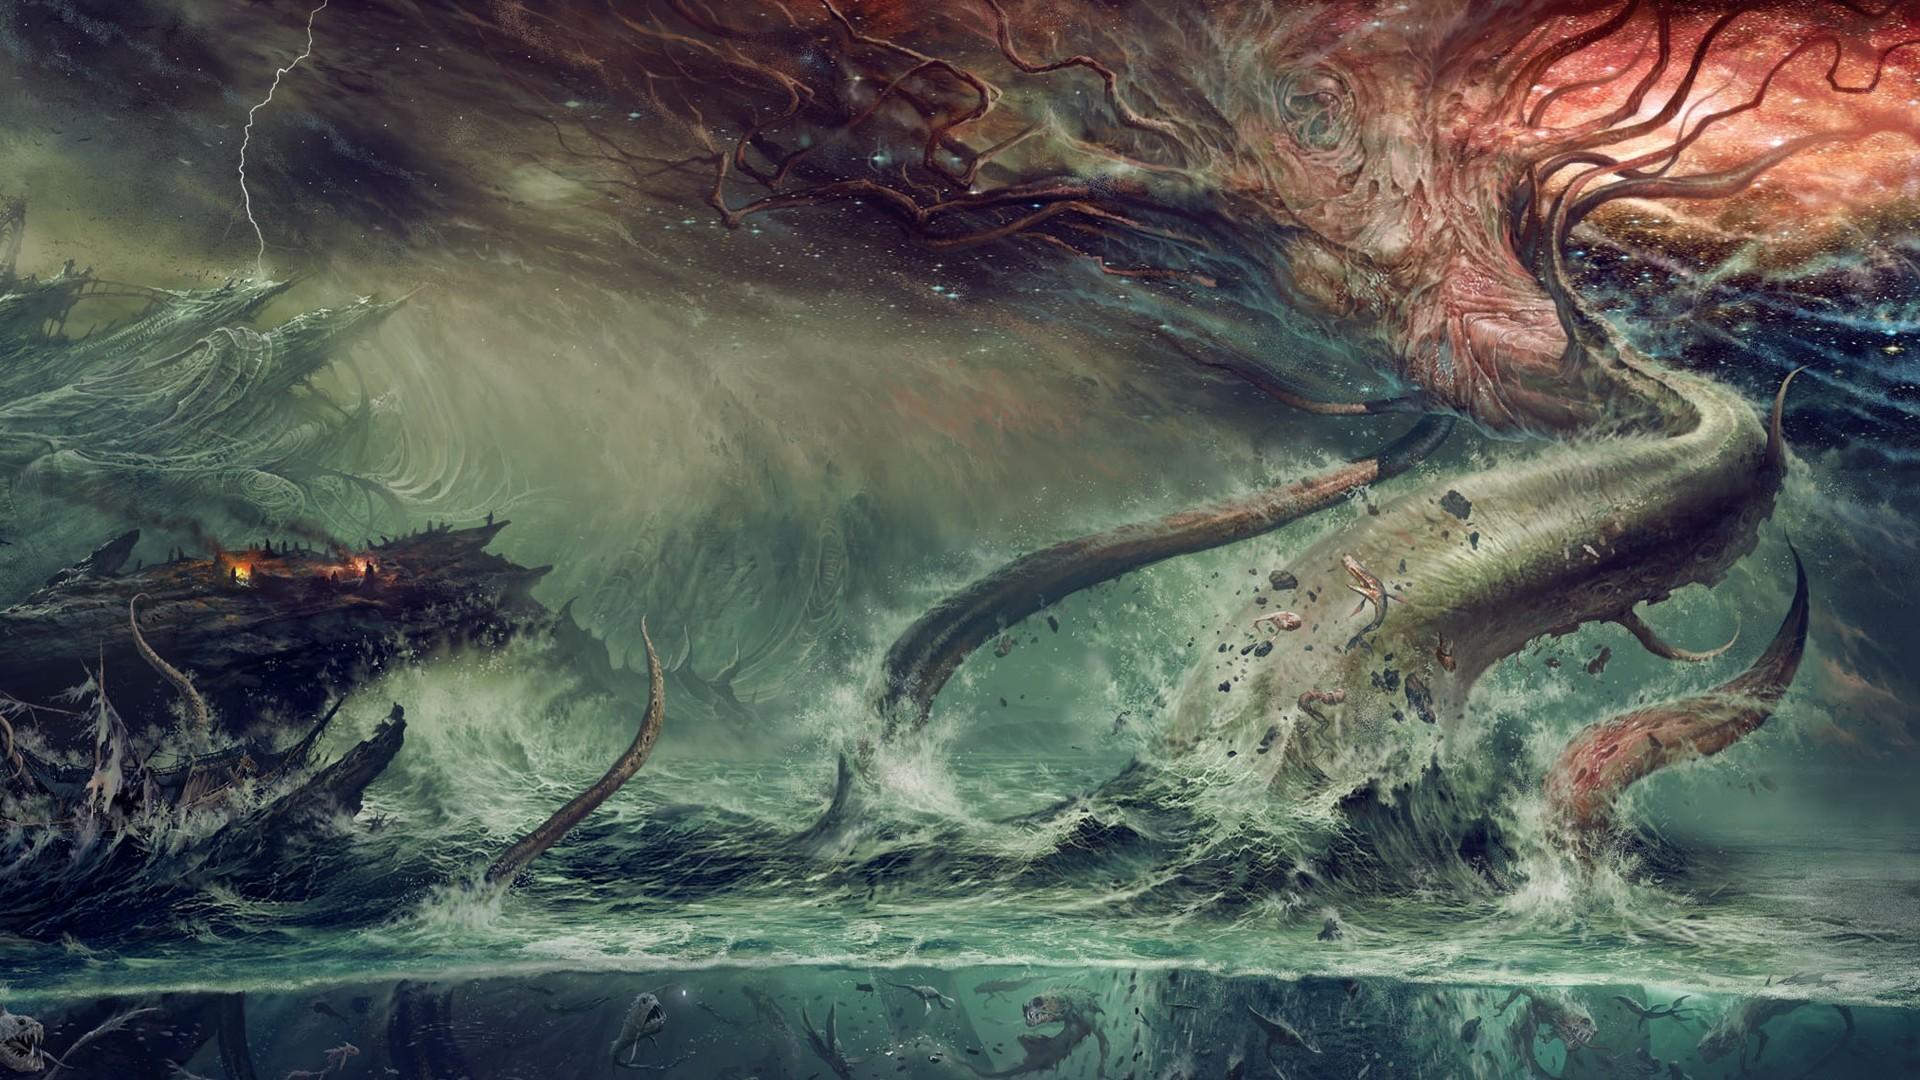 Lovecraft Wallpaper Free